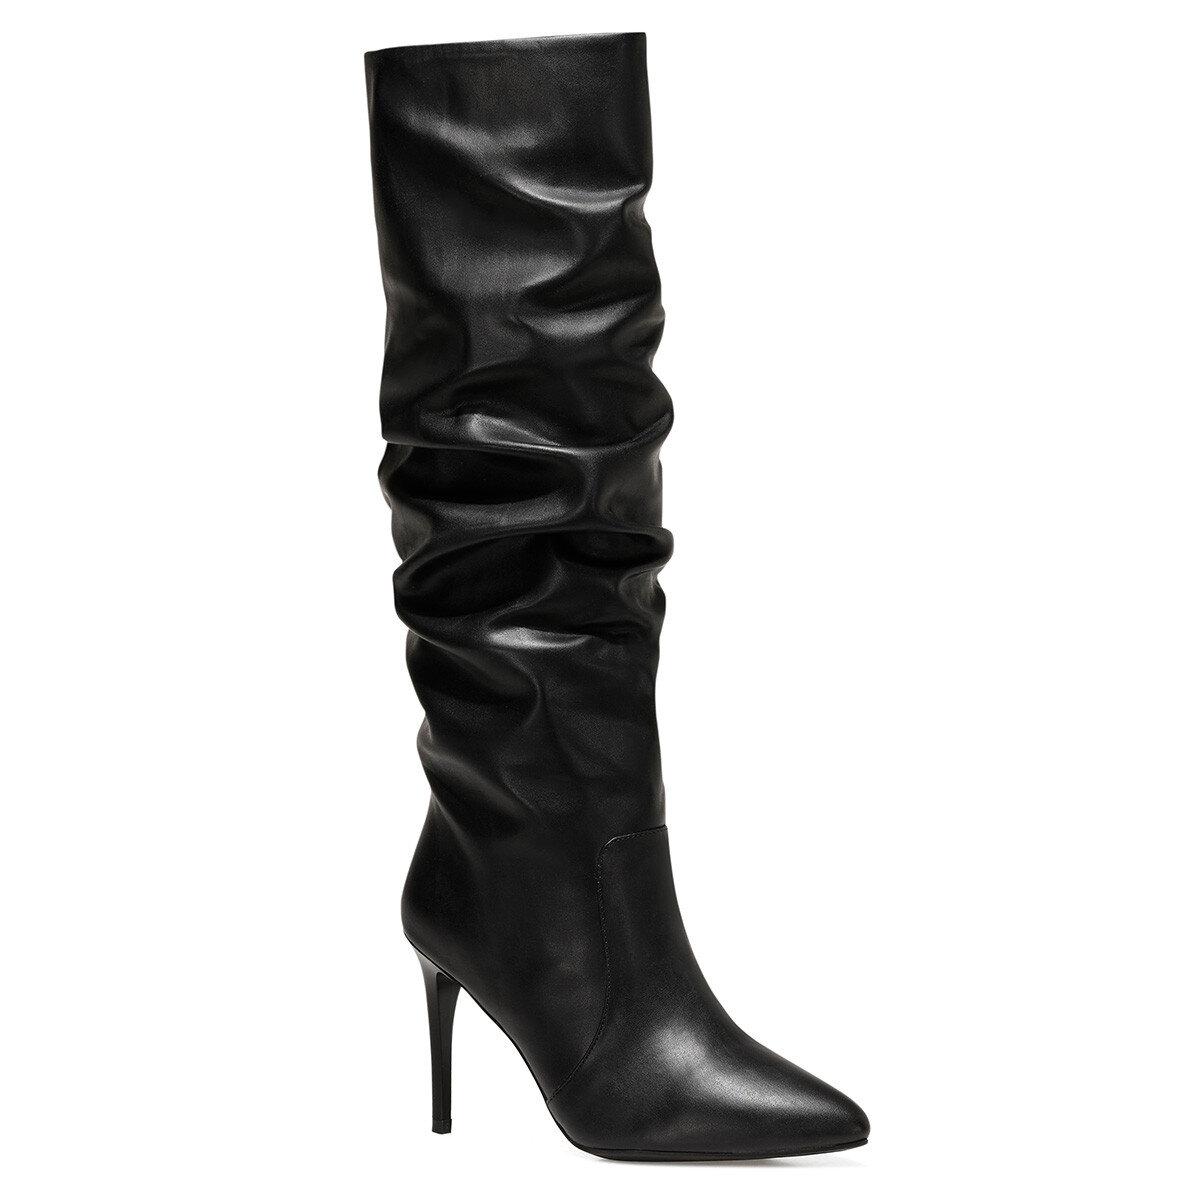 PINTO Siyah Kadın Topuklu Çizme